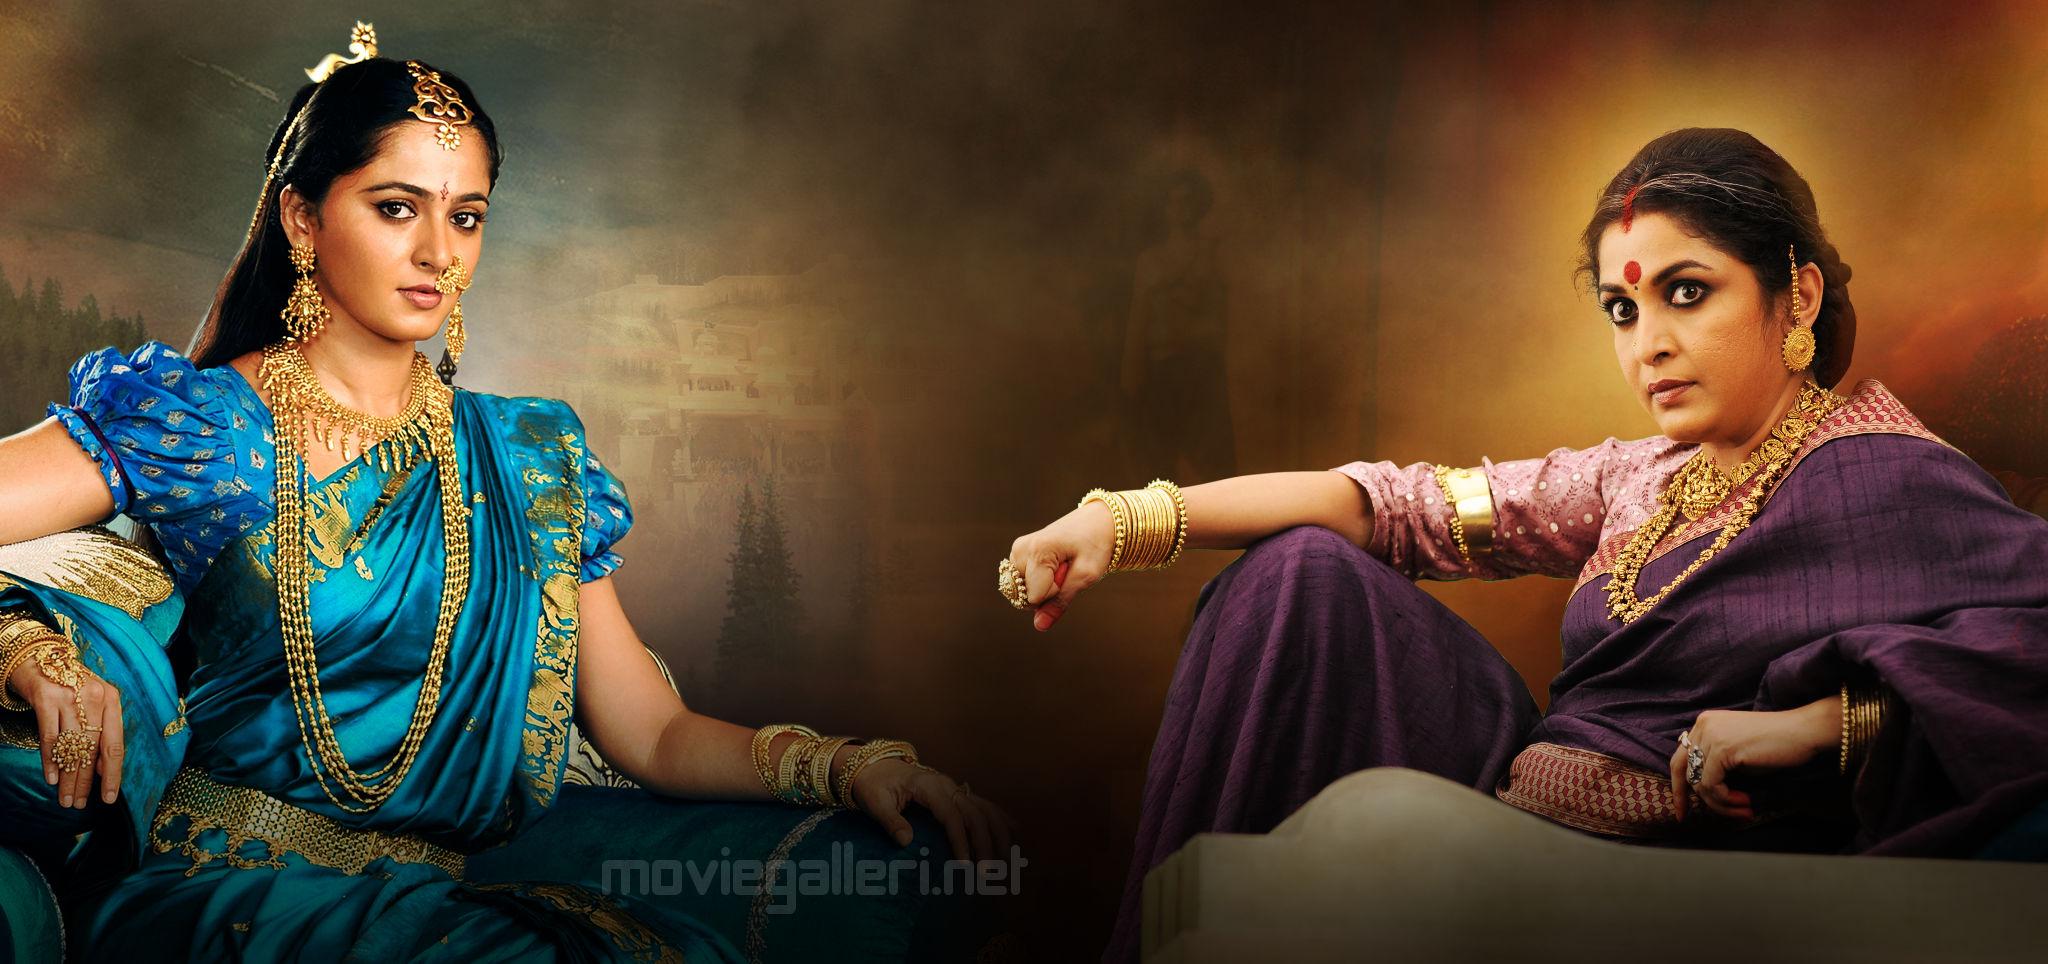 Anushka Shetty, Ramya Krishnan in Baahubali 2 New Images HD